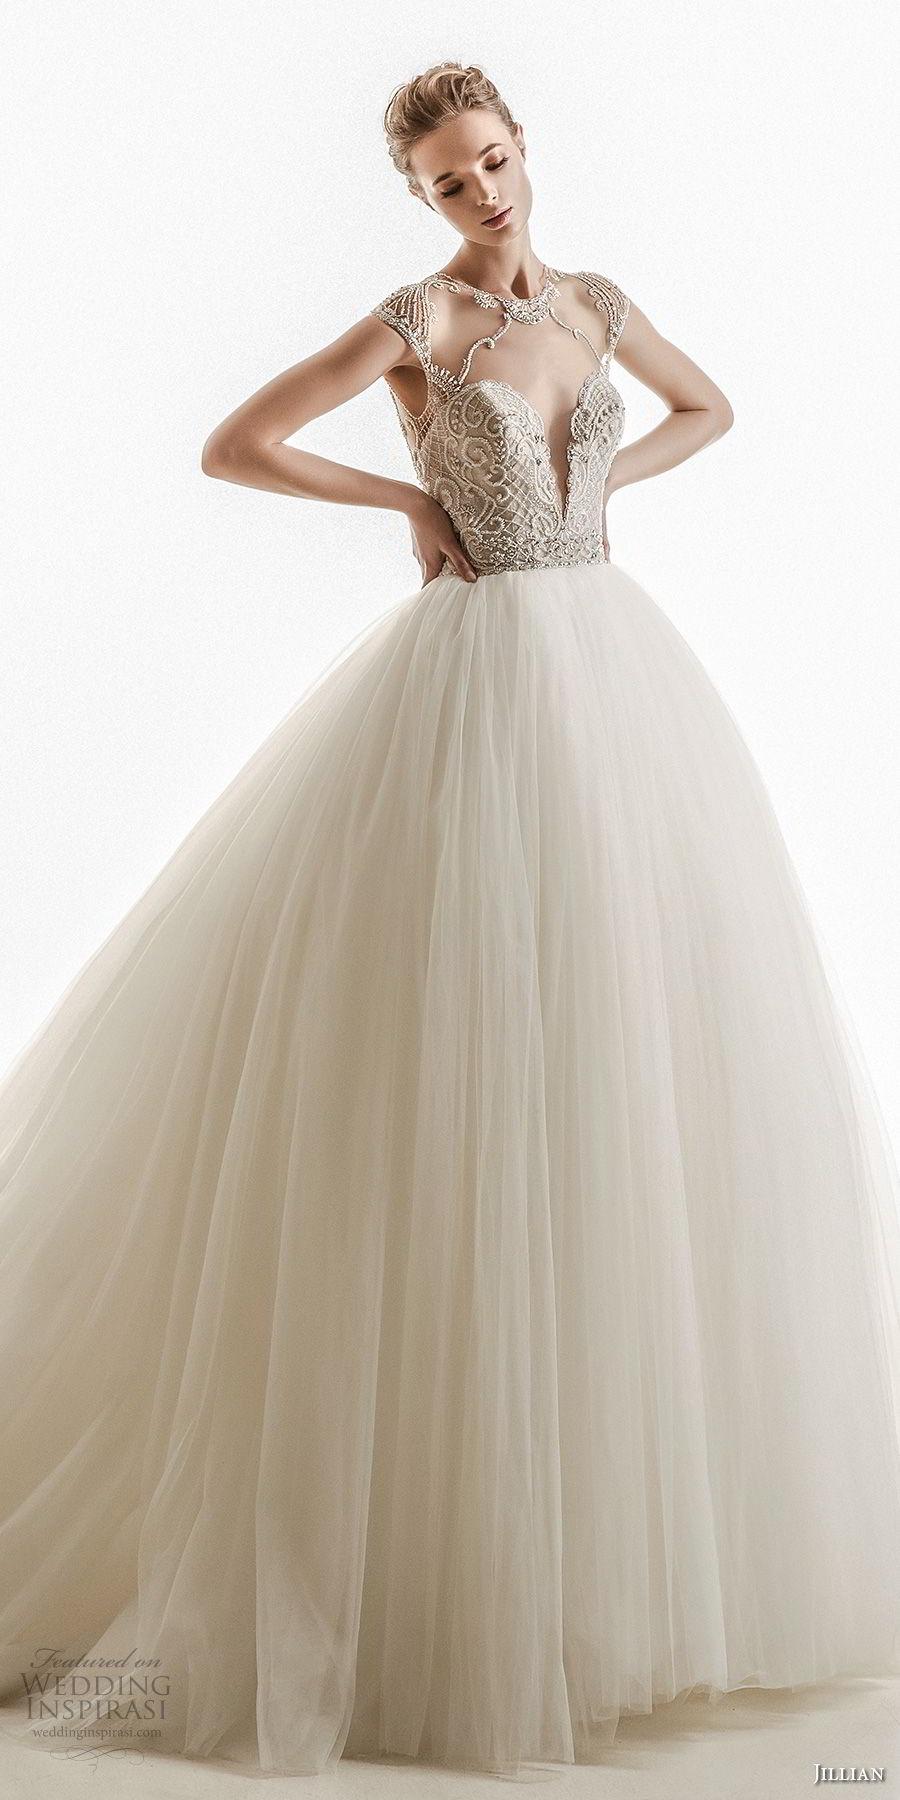 jillian 2018 bridal cap sleeves illusion jewel deep plunging sweetheart neckline heavily embellished bodice tulle skirt princess glamour wedding dress keyhole back chapel train (19) mv